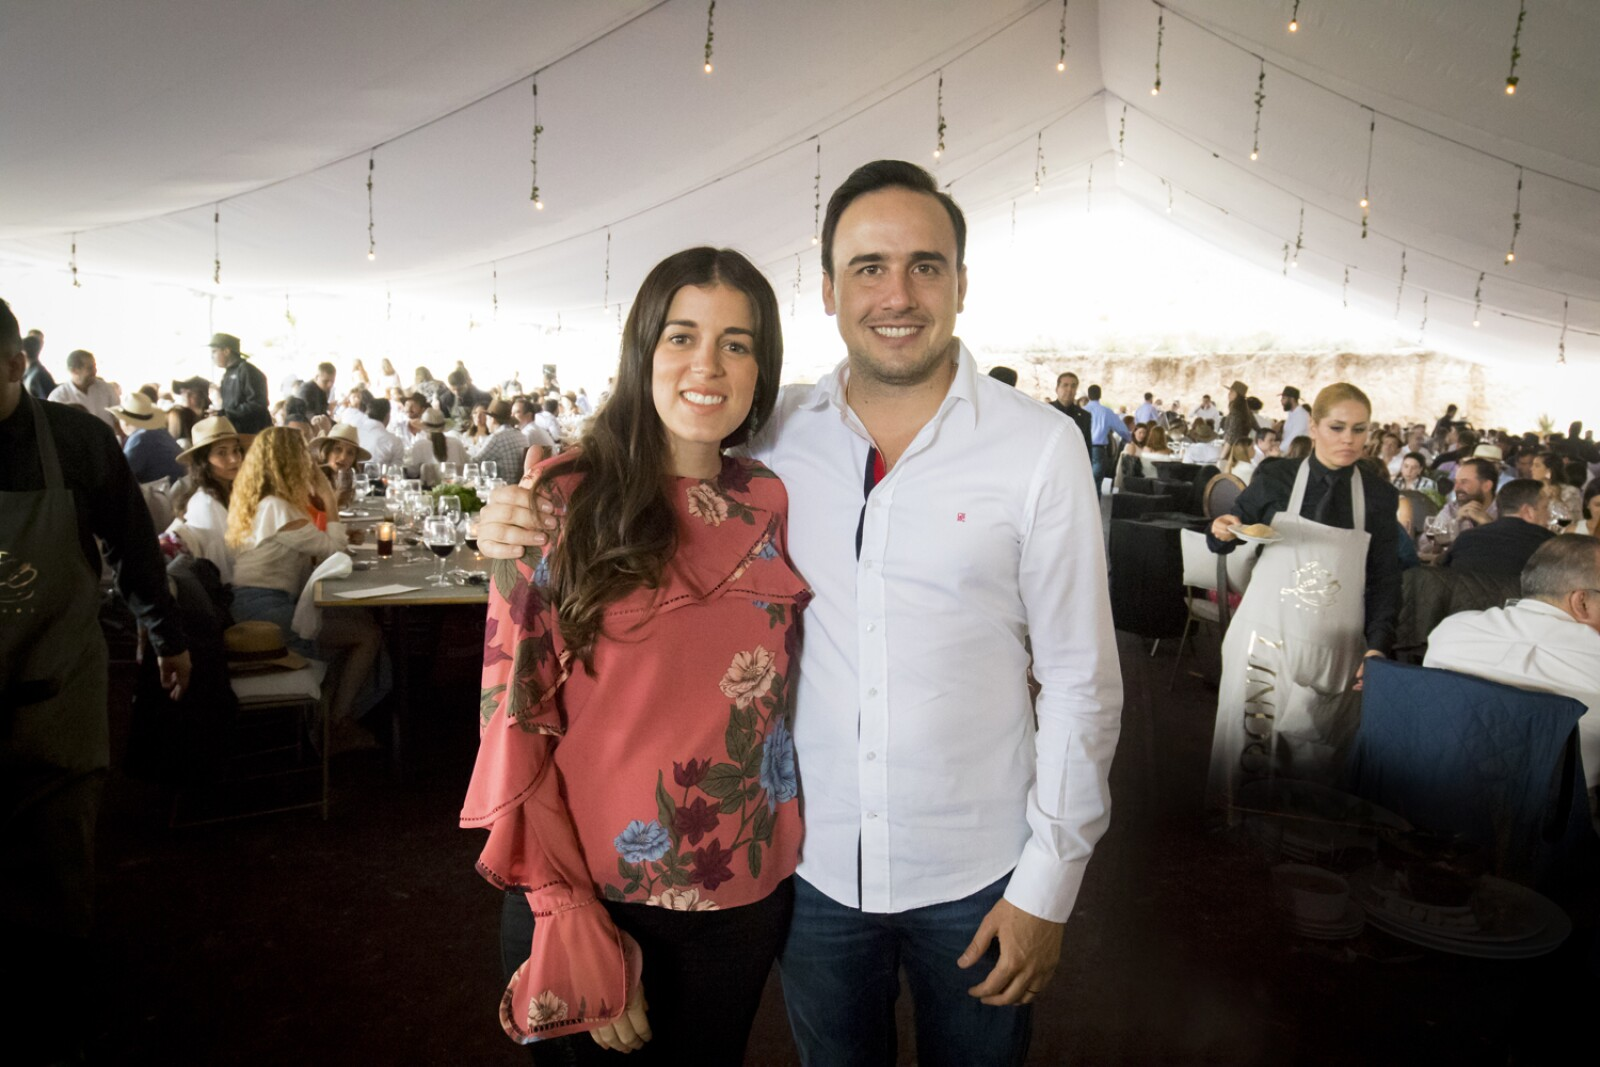 Manolo Jimenez y Paola Rodriguez.jpg